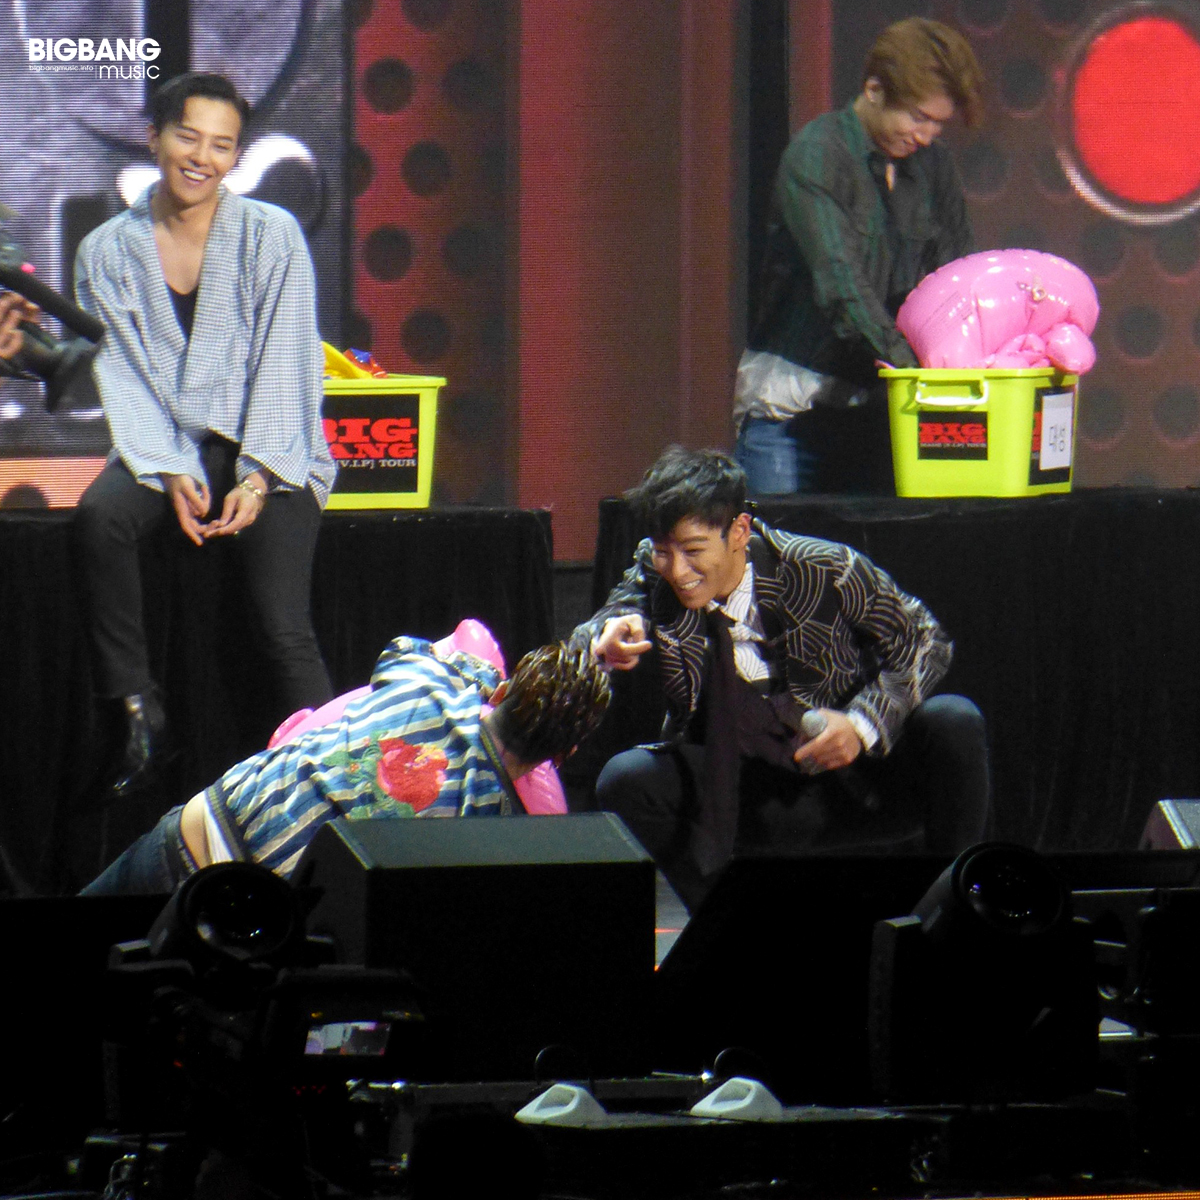 BBMusic-BIGBANG_FM_Beijing_Day3_2016-07-17_12